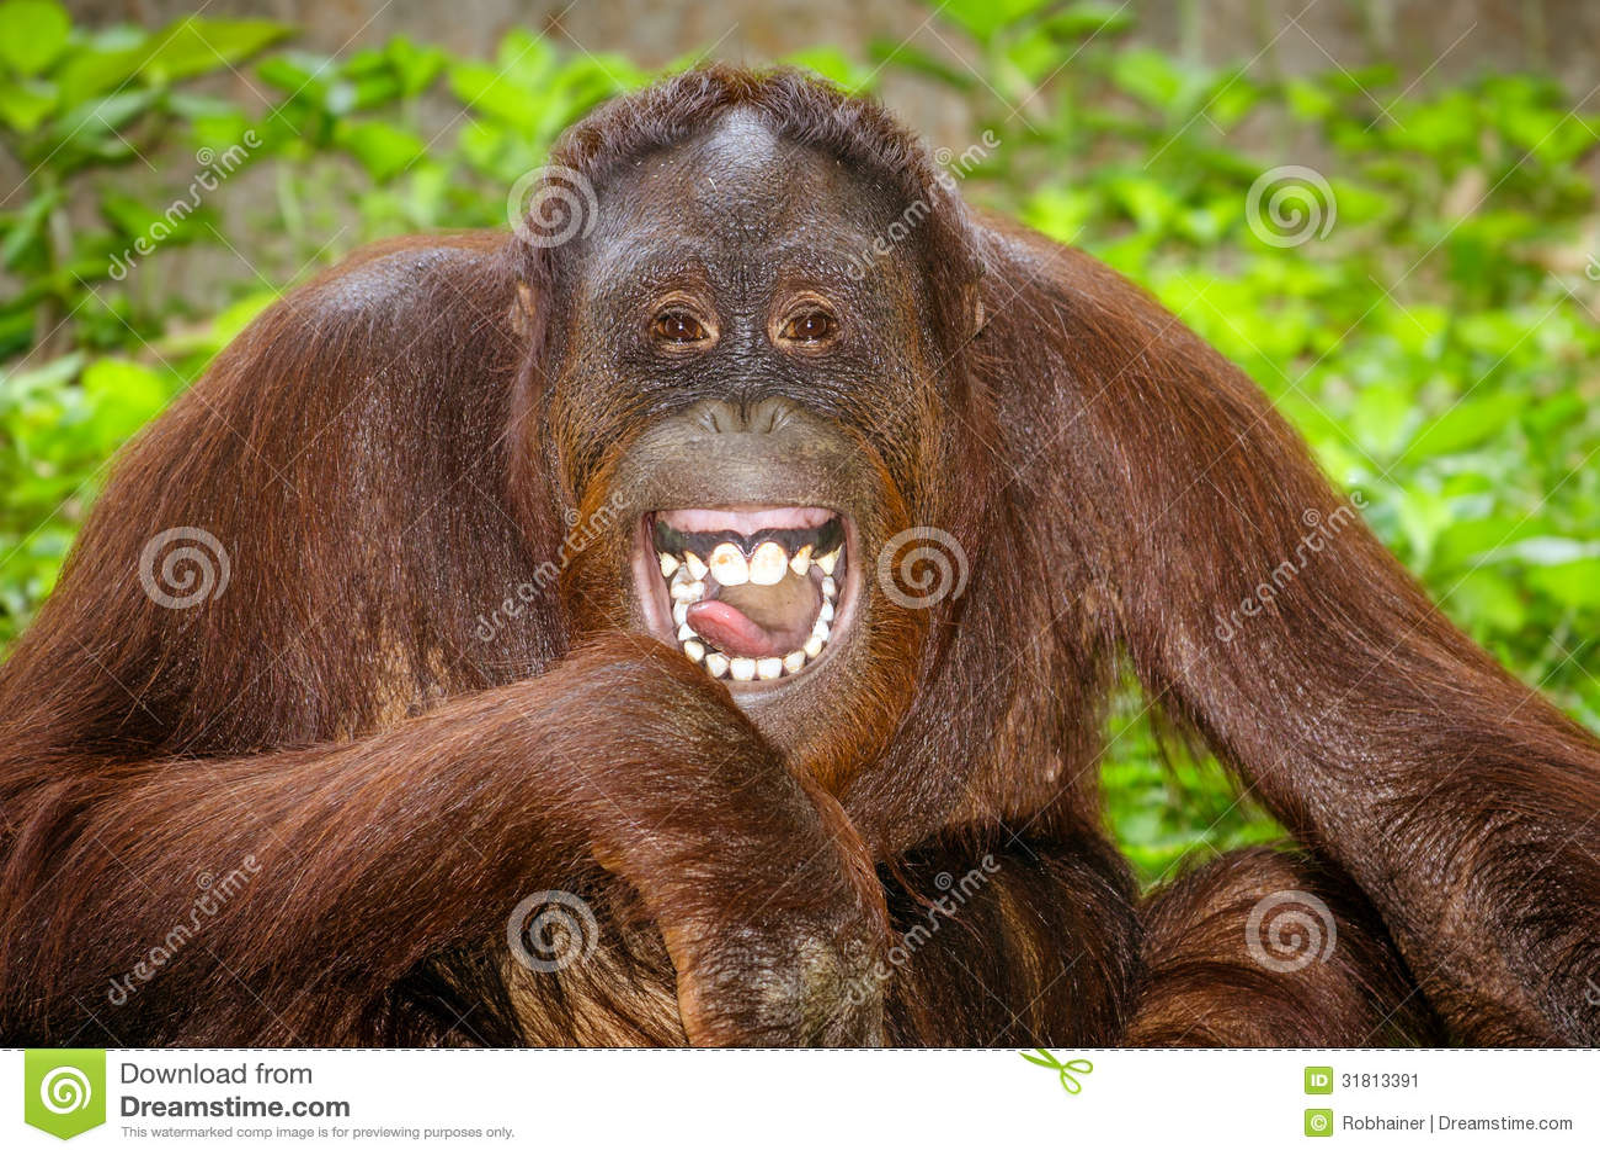 Porträt von Orang-Utan (Pongo pygmaeus) Lachen